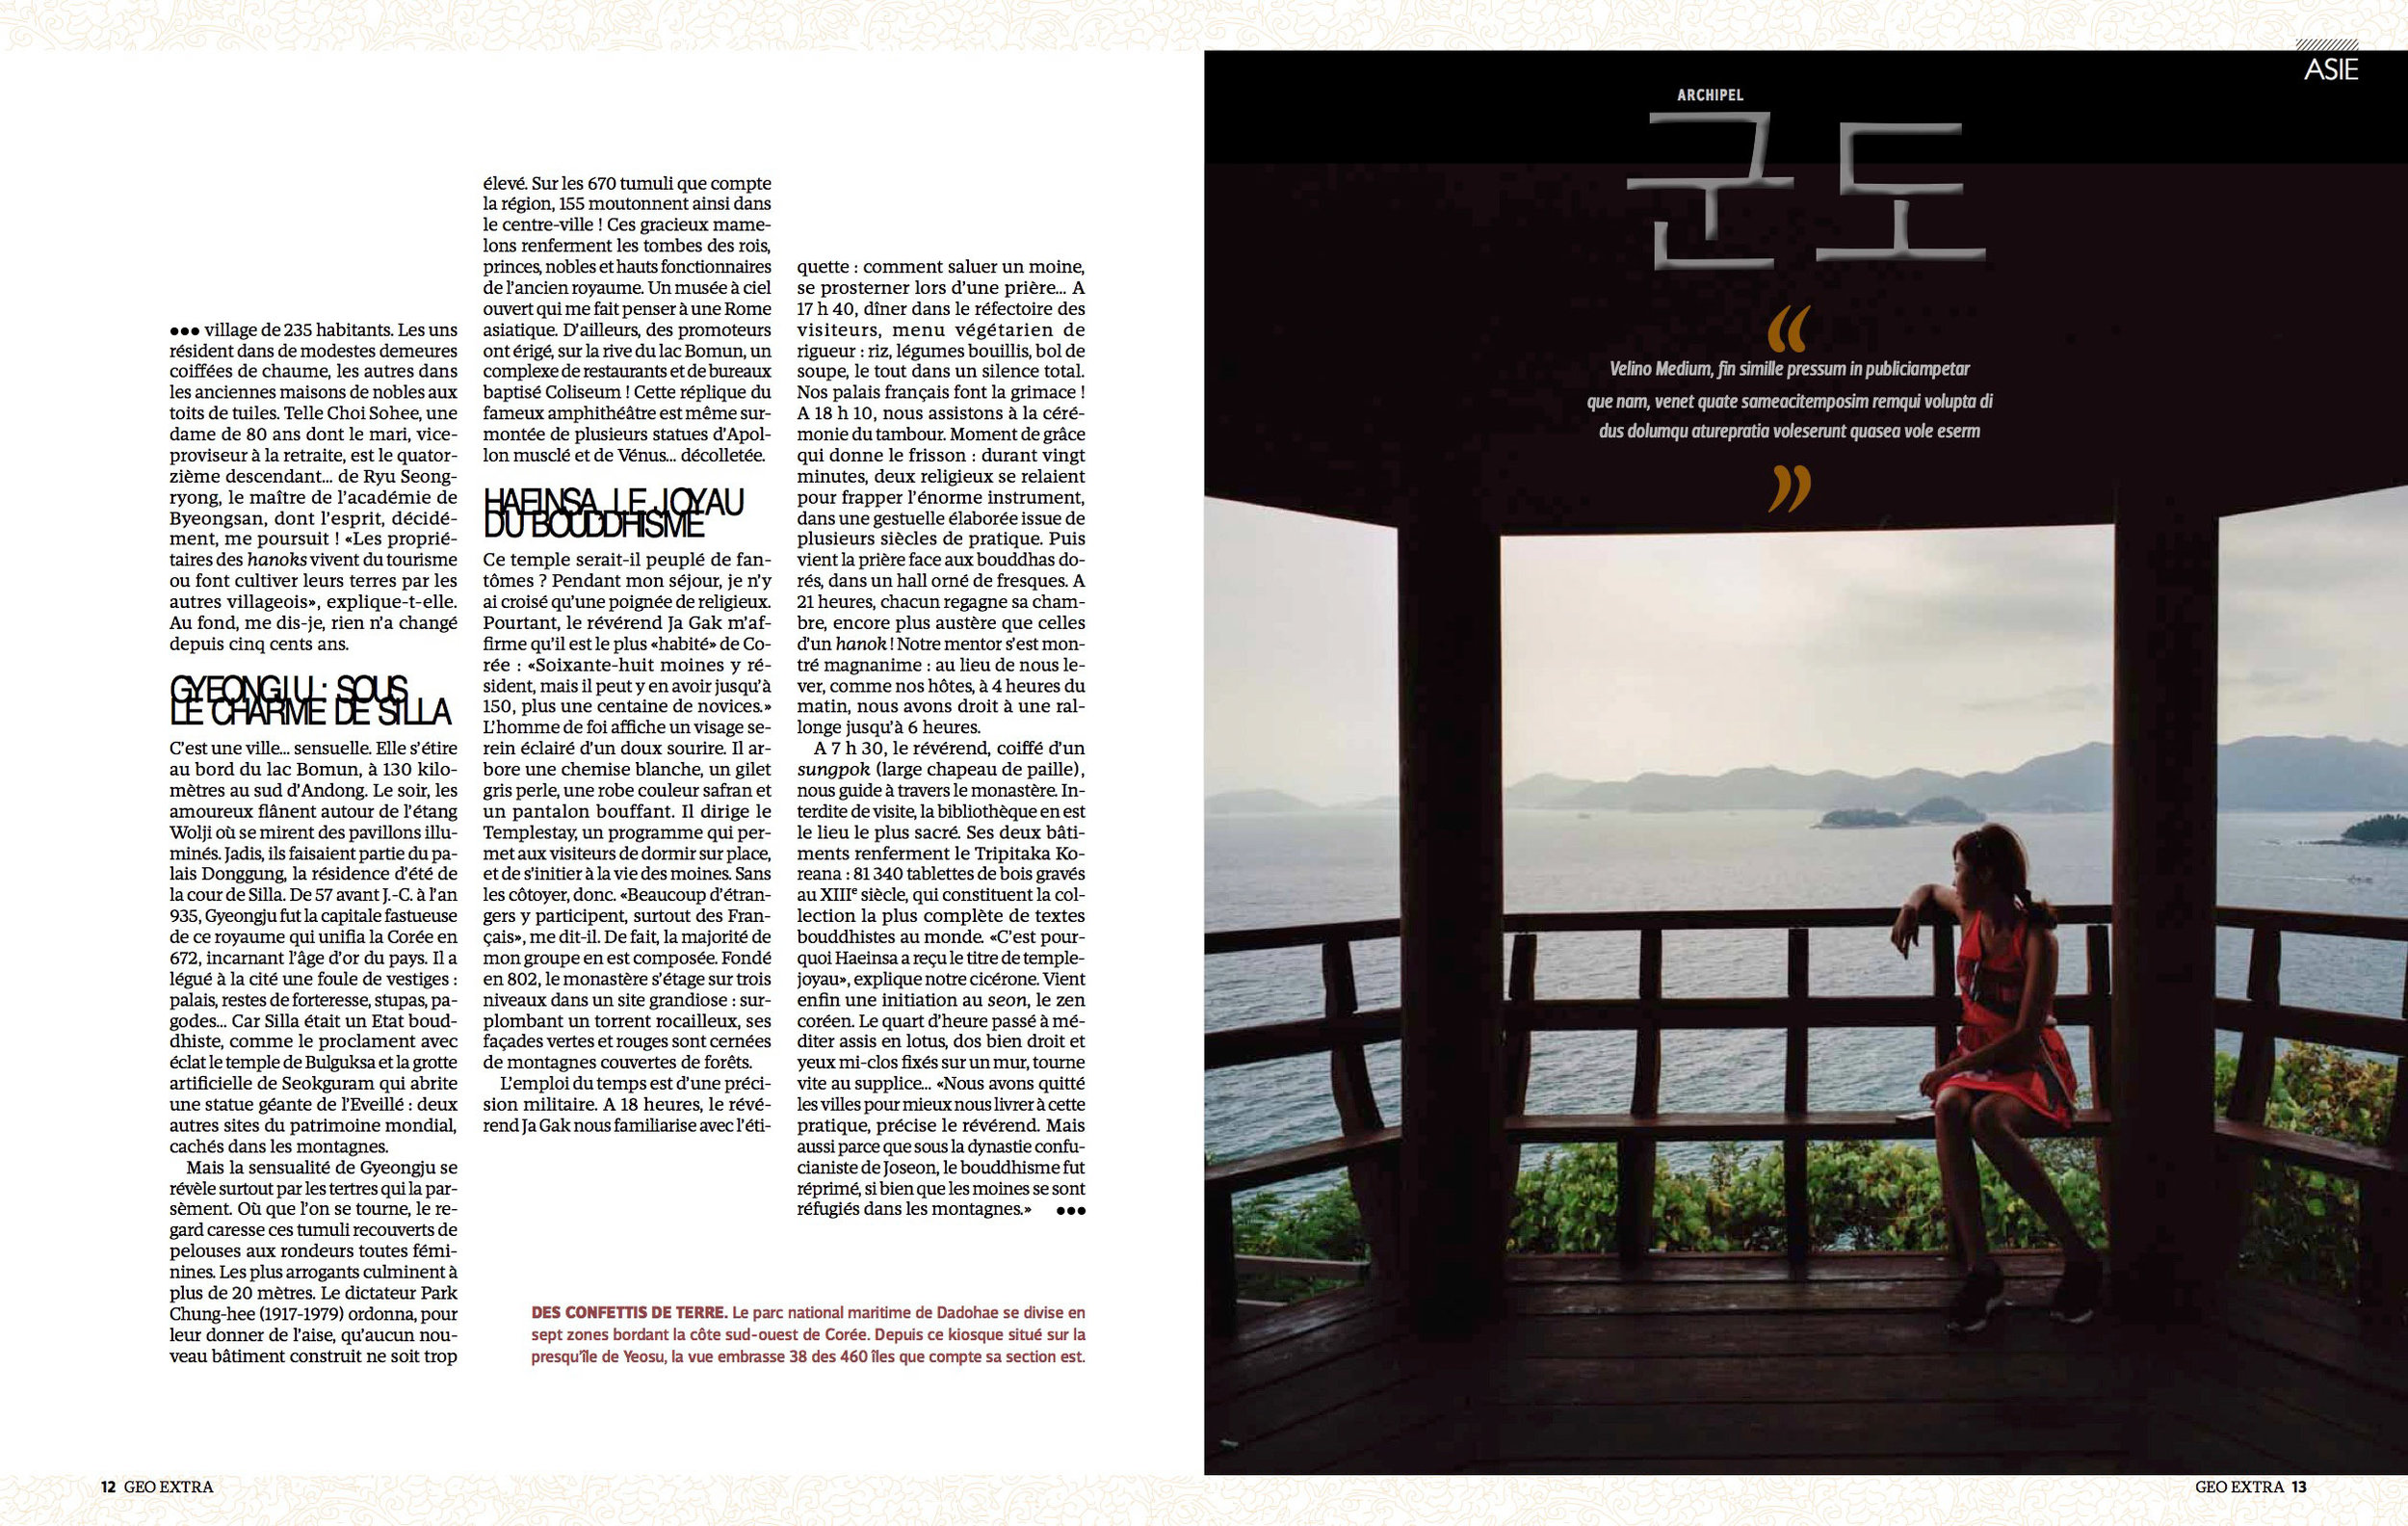 geo-travel-korea-photographer-06.jpg